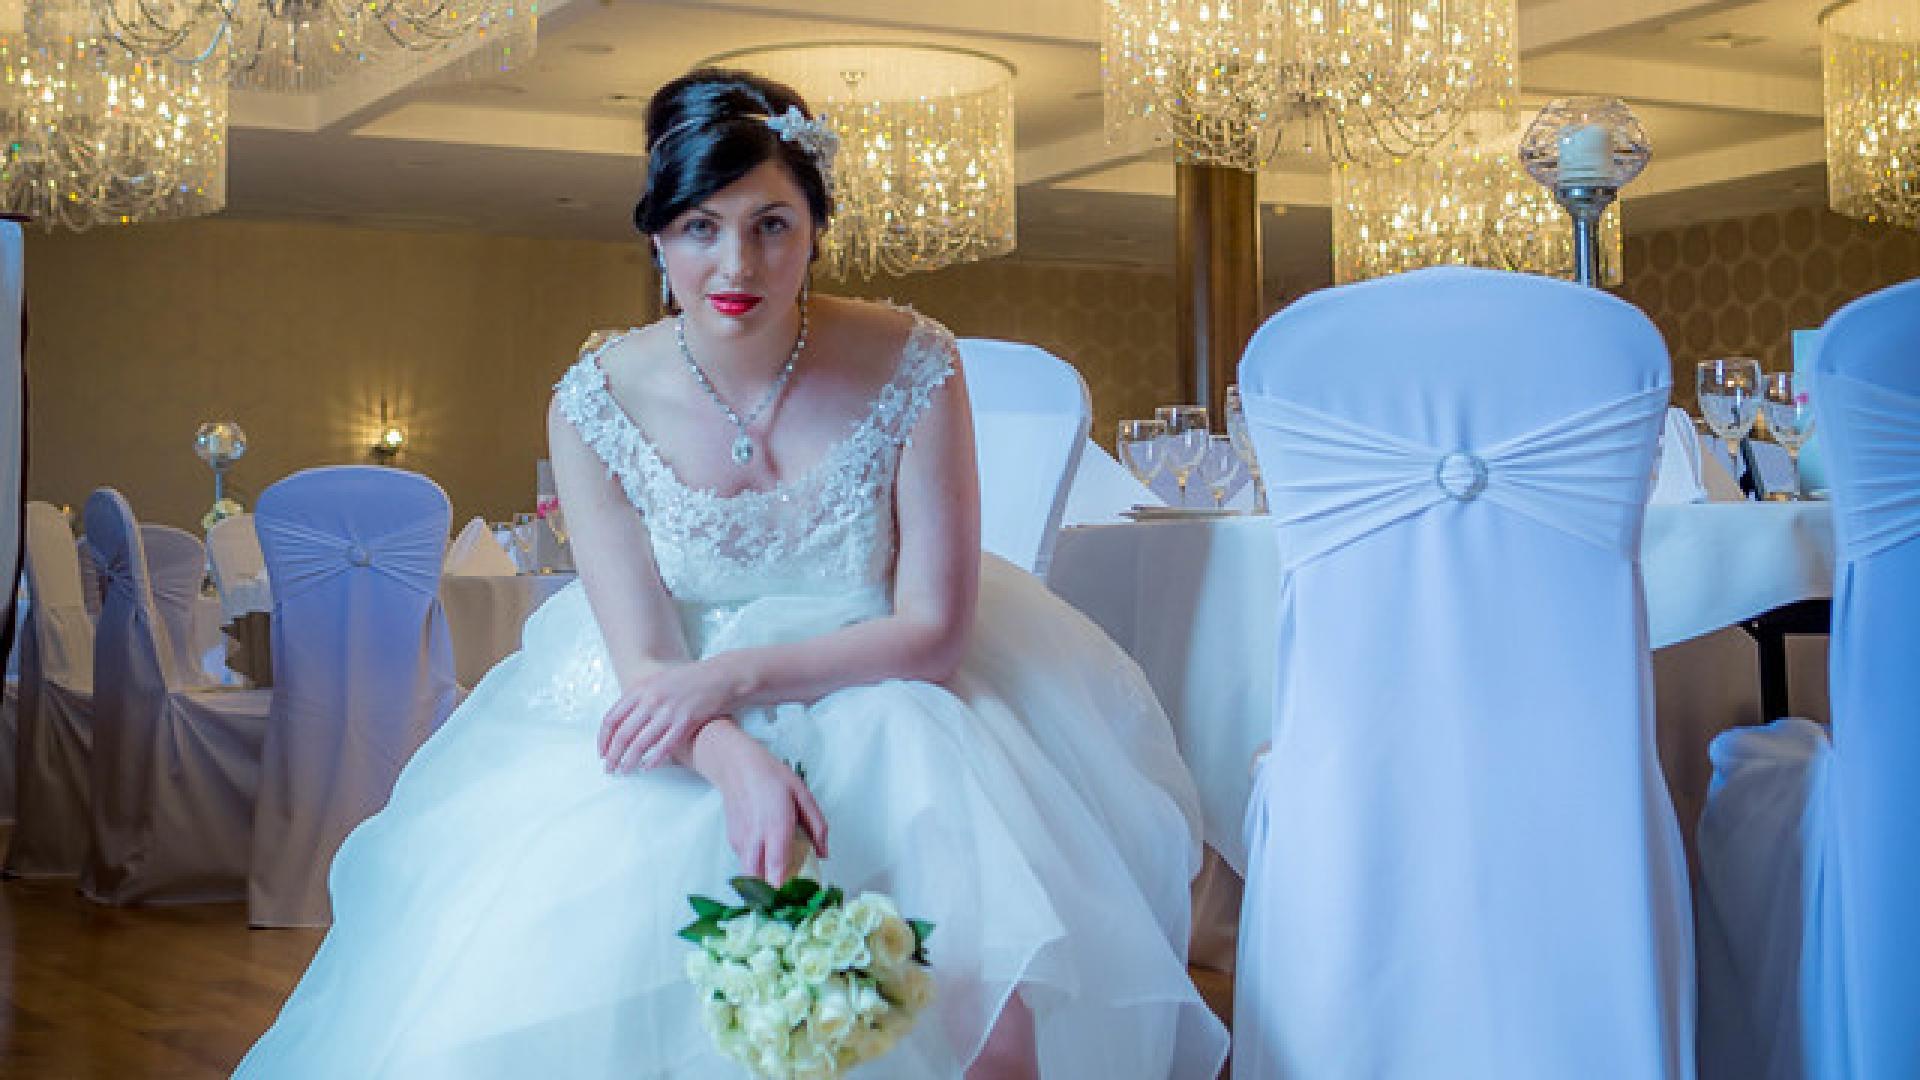 Cavan Crystal Wedding Photos | View Our Wedding Gallery